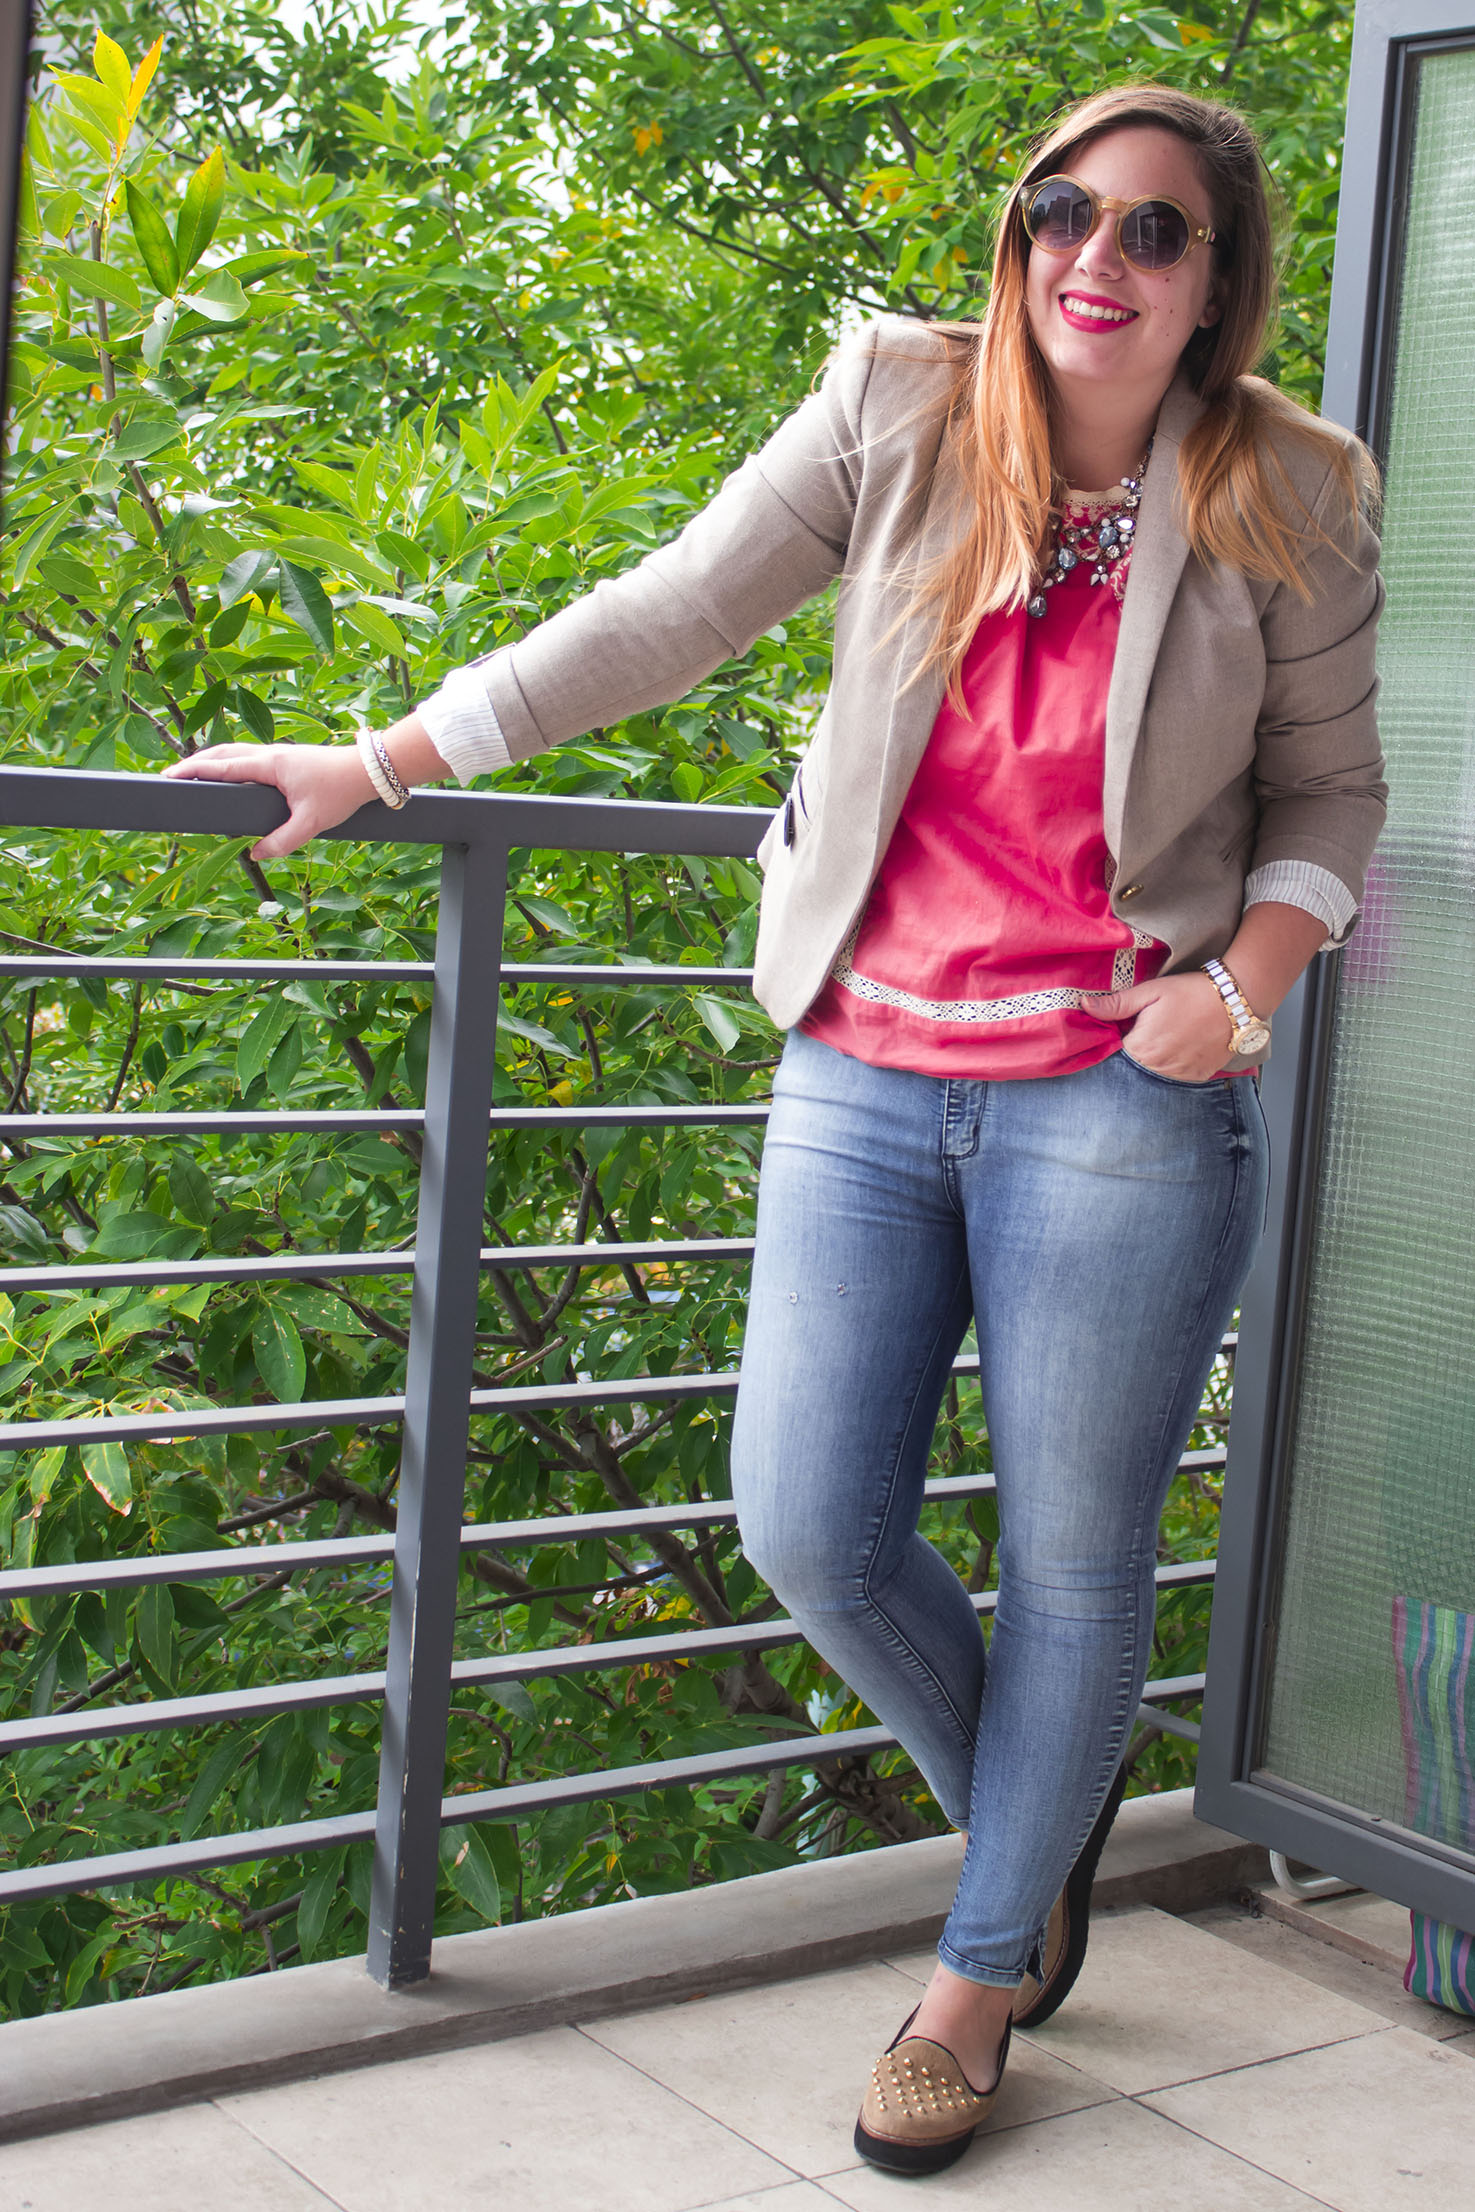 Get the look: Jeans, Las Pepas. Blusa, Wanama. Blazer, Zara. Collar, Zara Paris. Panchas, Lucerna. Sobre, Besha. Gafas, Infinit. Reloj, Michael Kors.